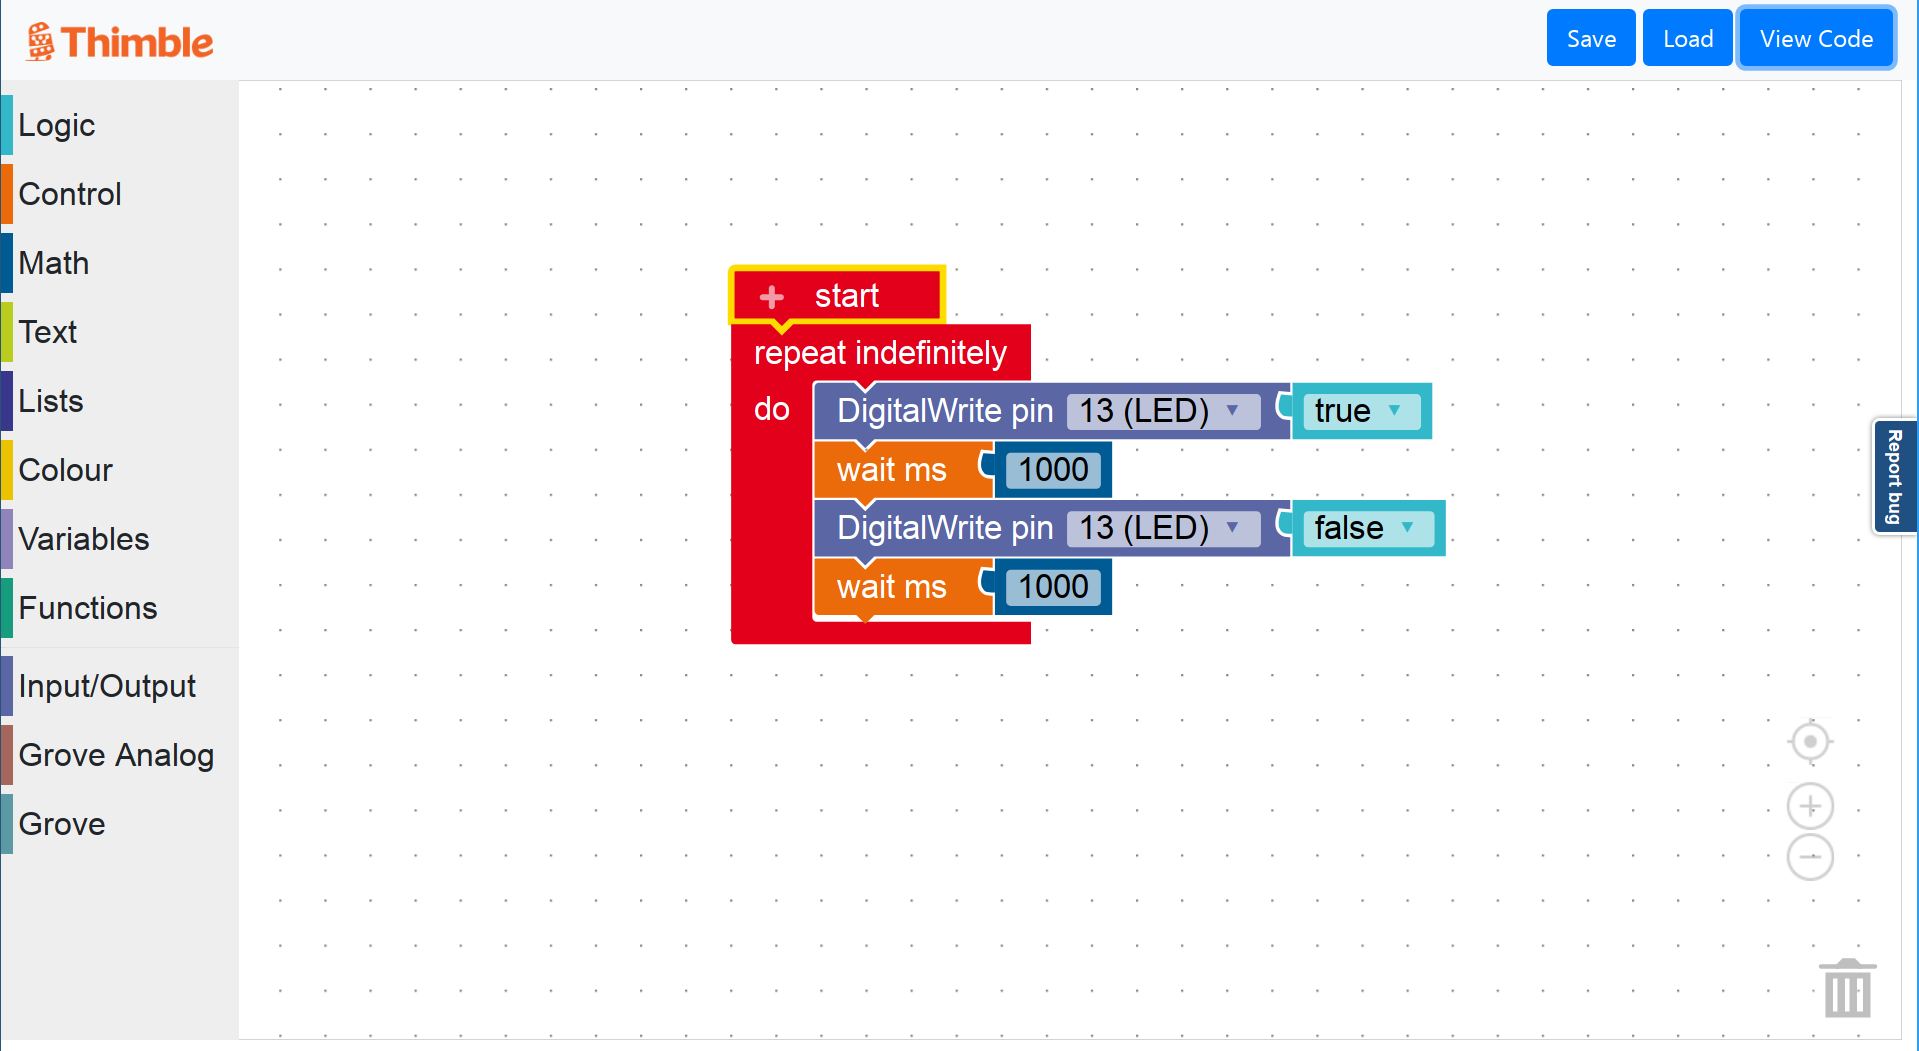 Thimble Blockly Beta Test - Thimble Blockly - Thimble Community